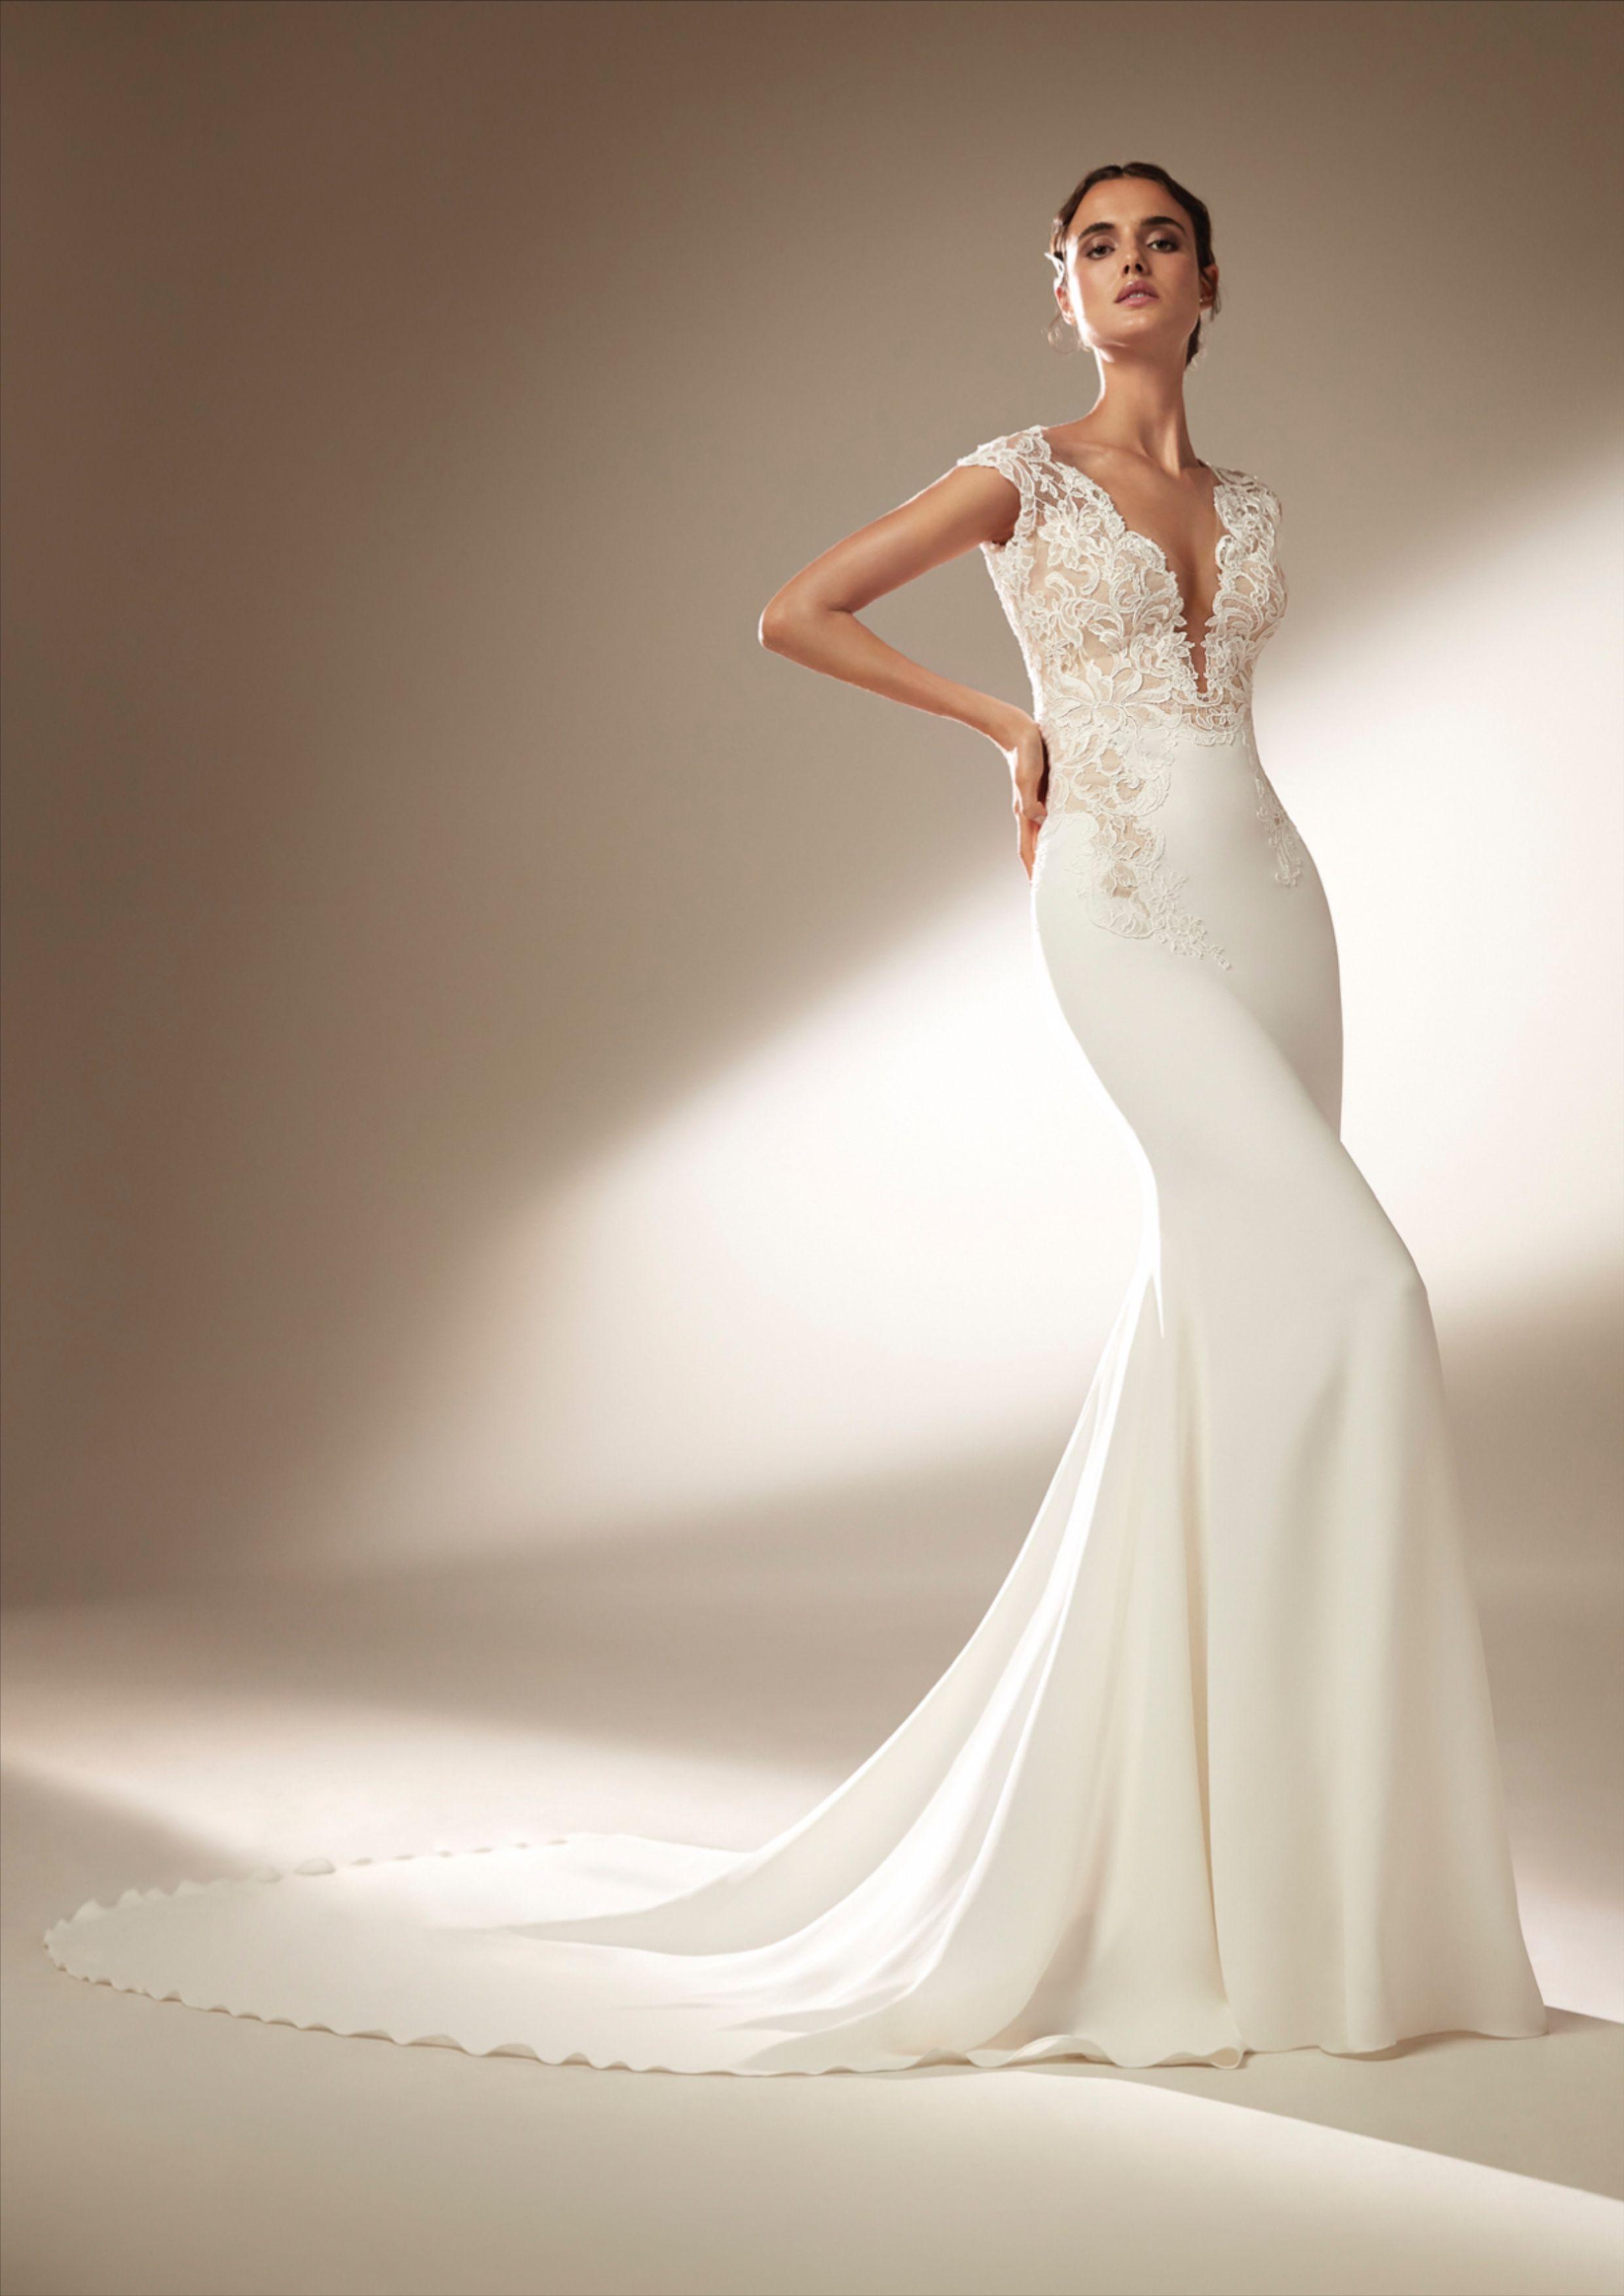 Swanson Dress Atelierpronovias In 2020 Wedding Gown Backless Wedding Dresses Stunning Wedding Dresses